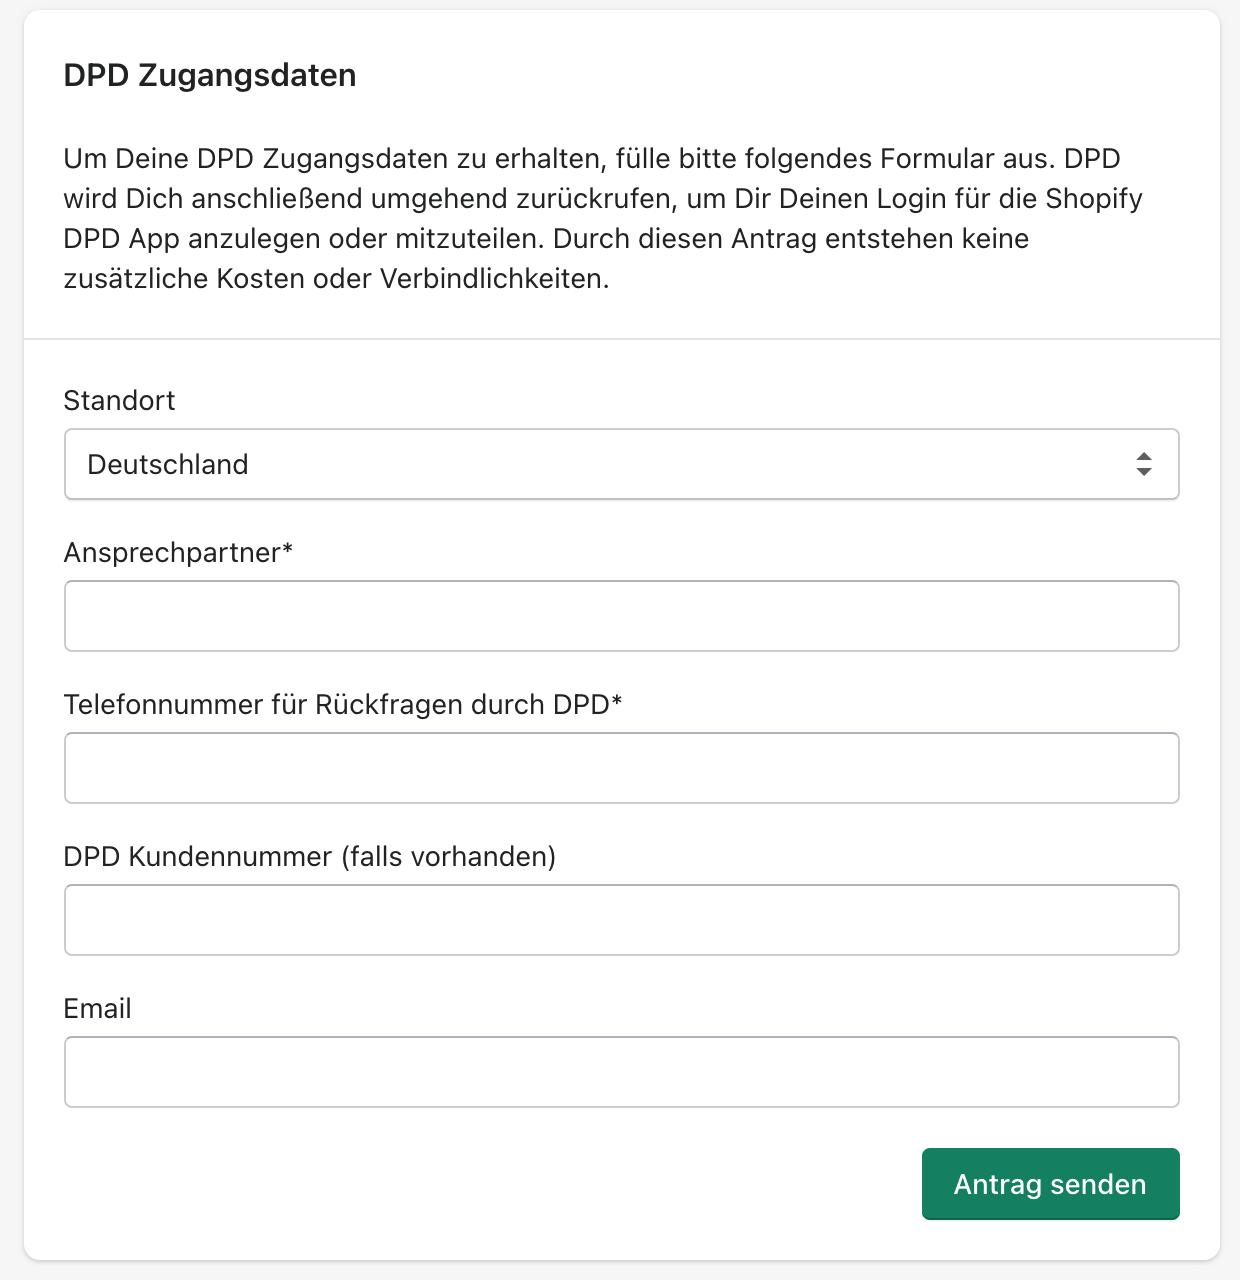 DPD Webservice Zugangsdaten